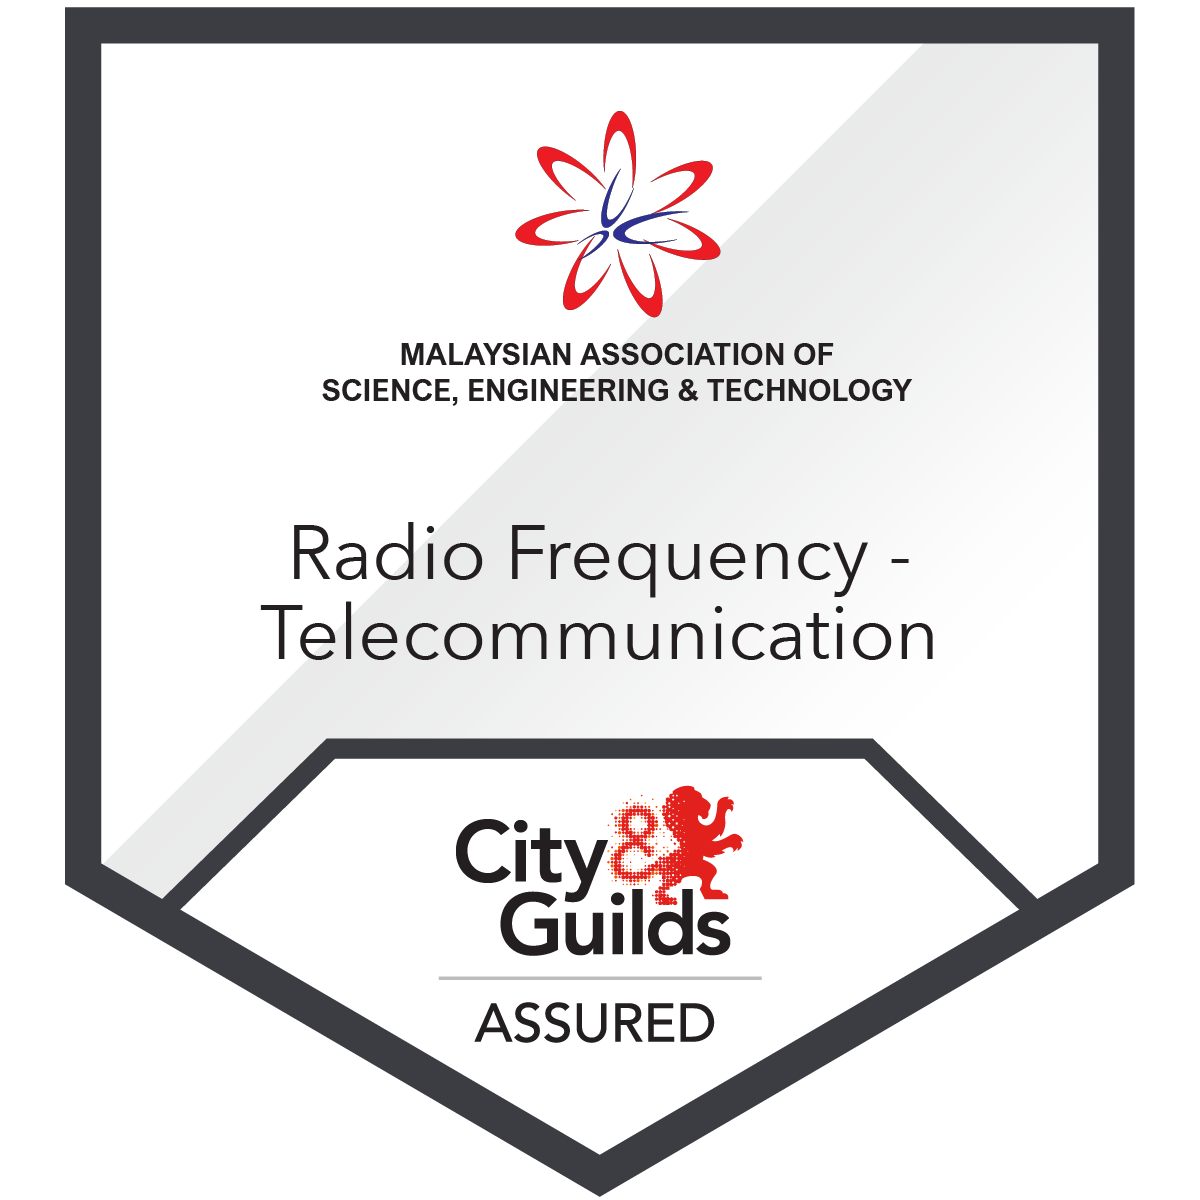 Radio Frequency Network Installation & Maintenance -Telecommunication